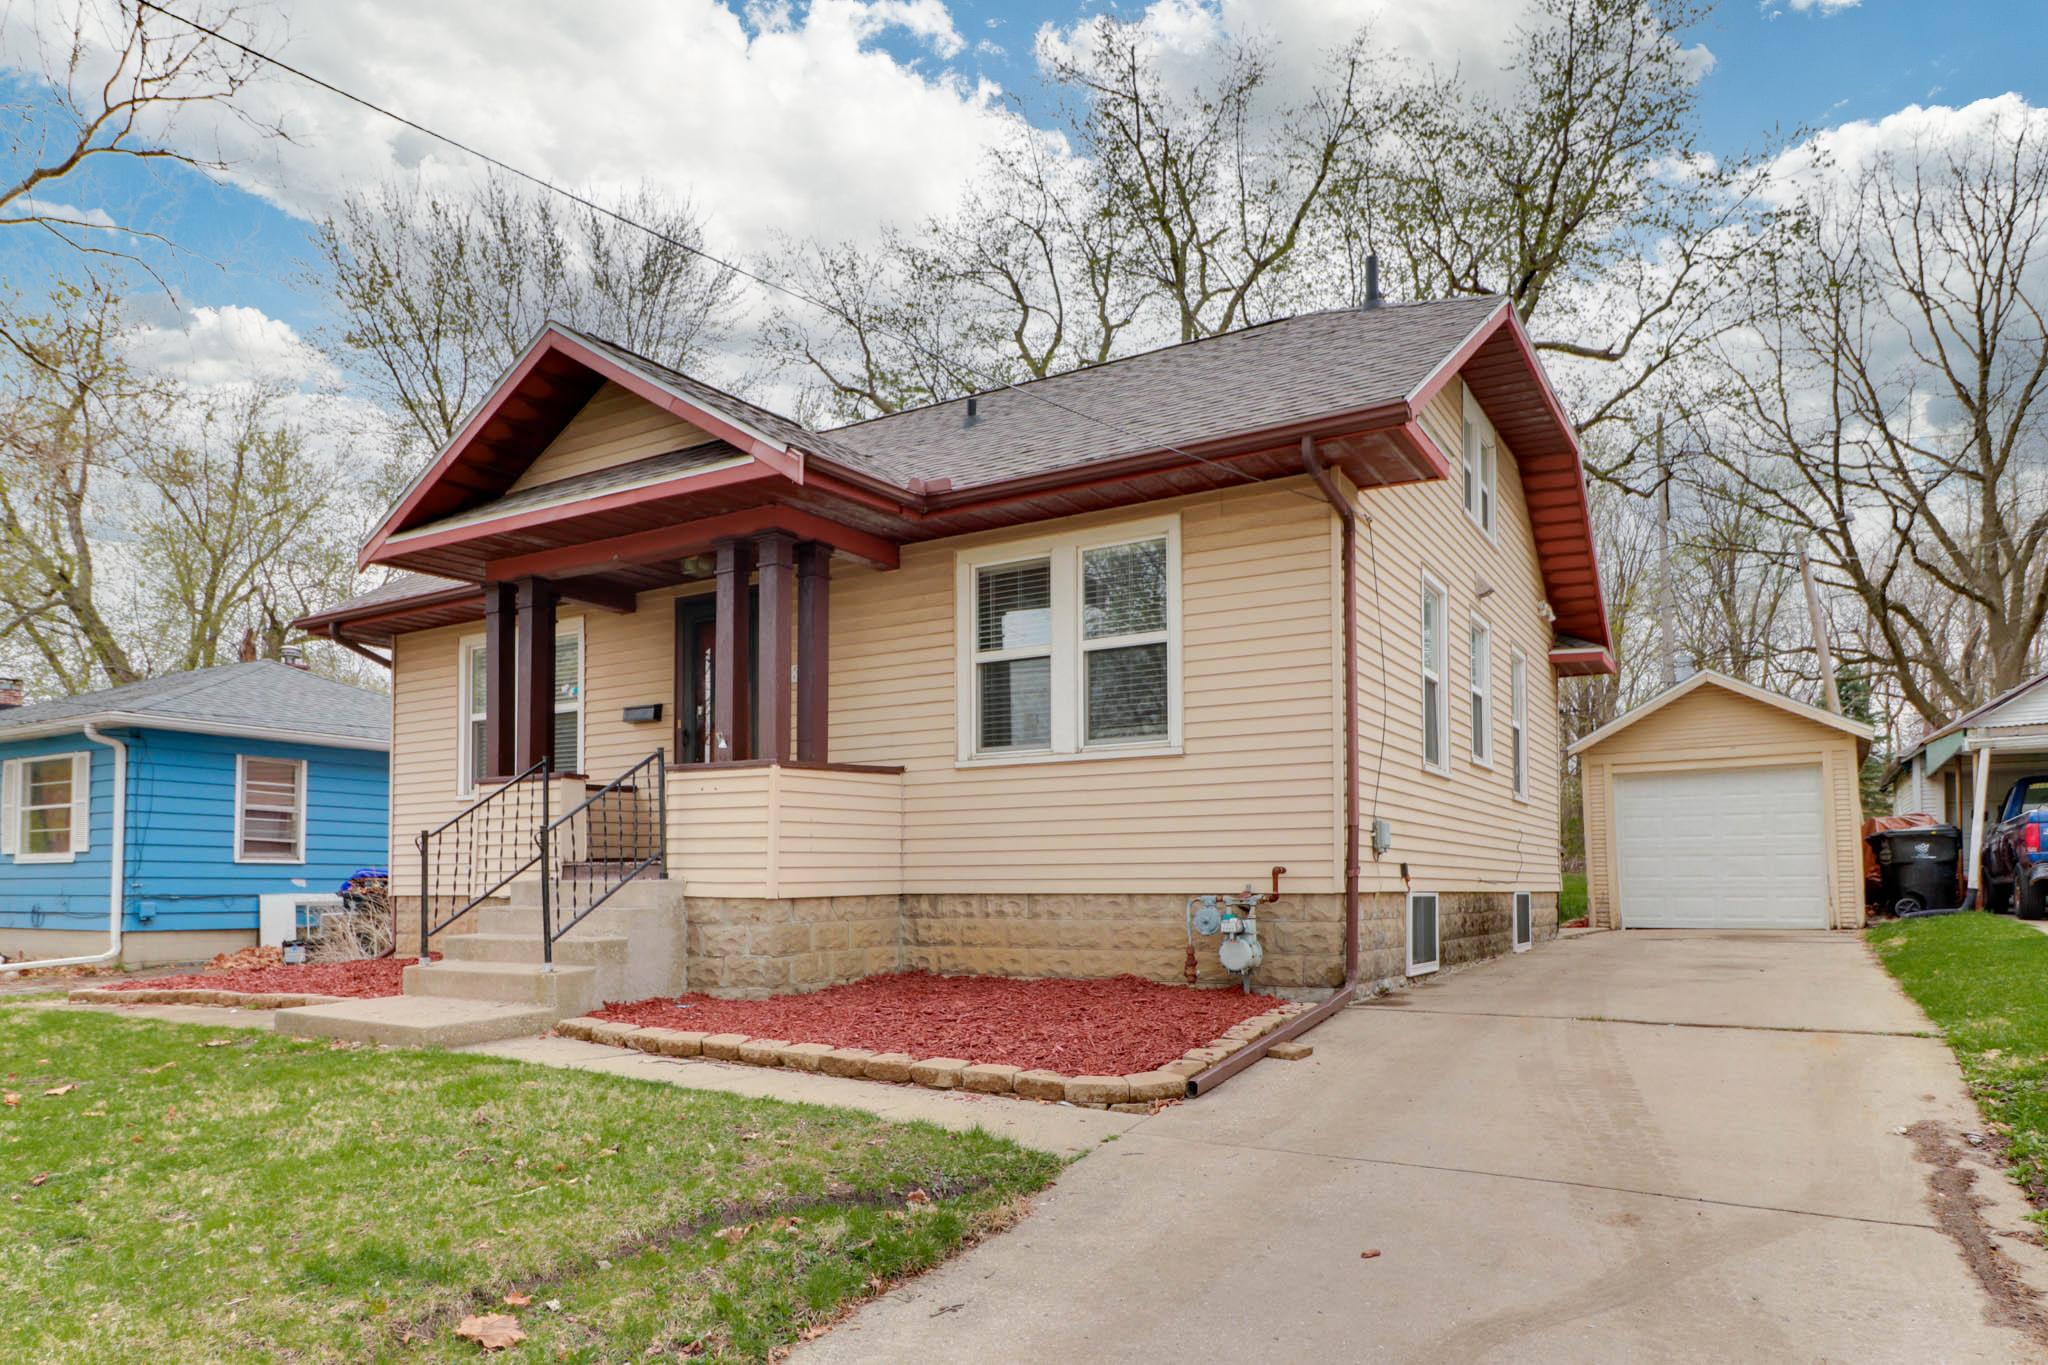 1316 N. Linden, Normal, IL 61761